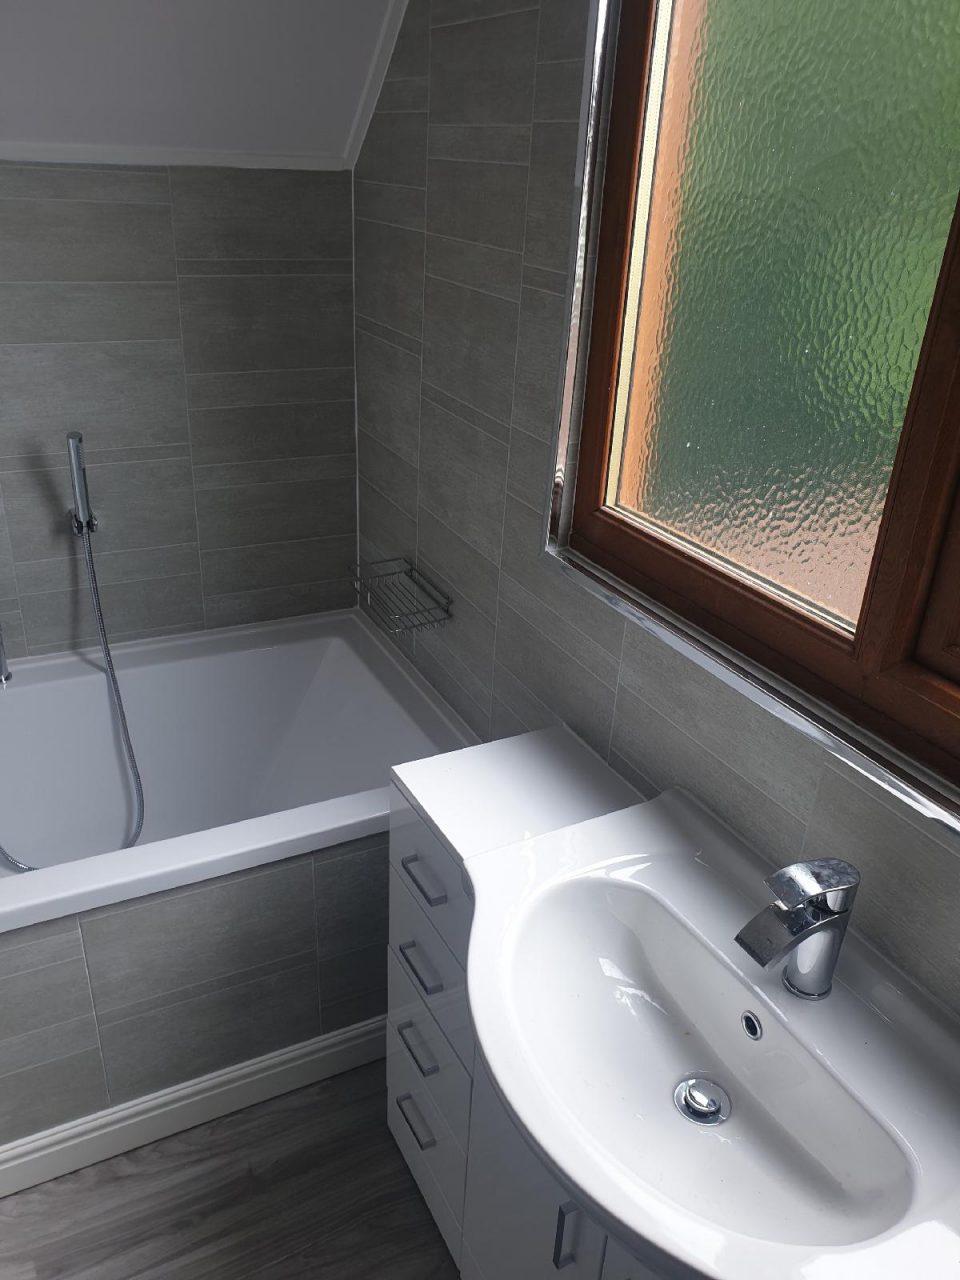 New Bathroom Mrs Wootton in Birmingham Sink Built into Unit